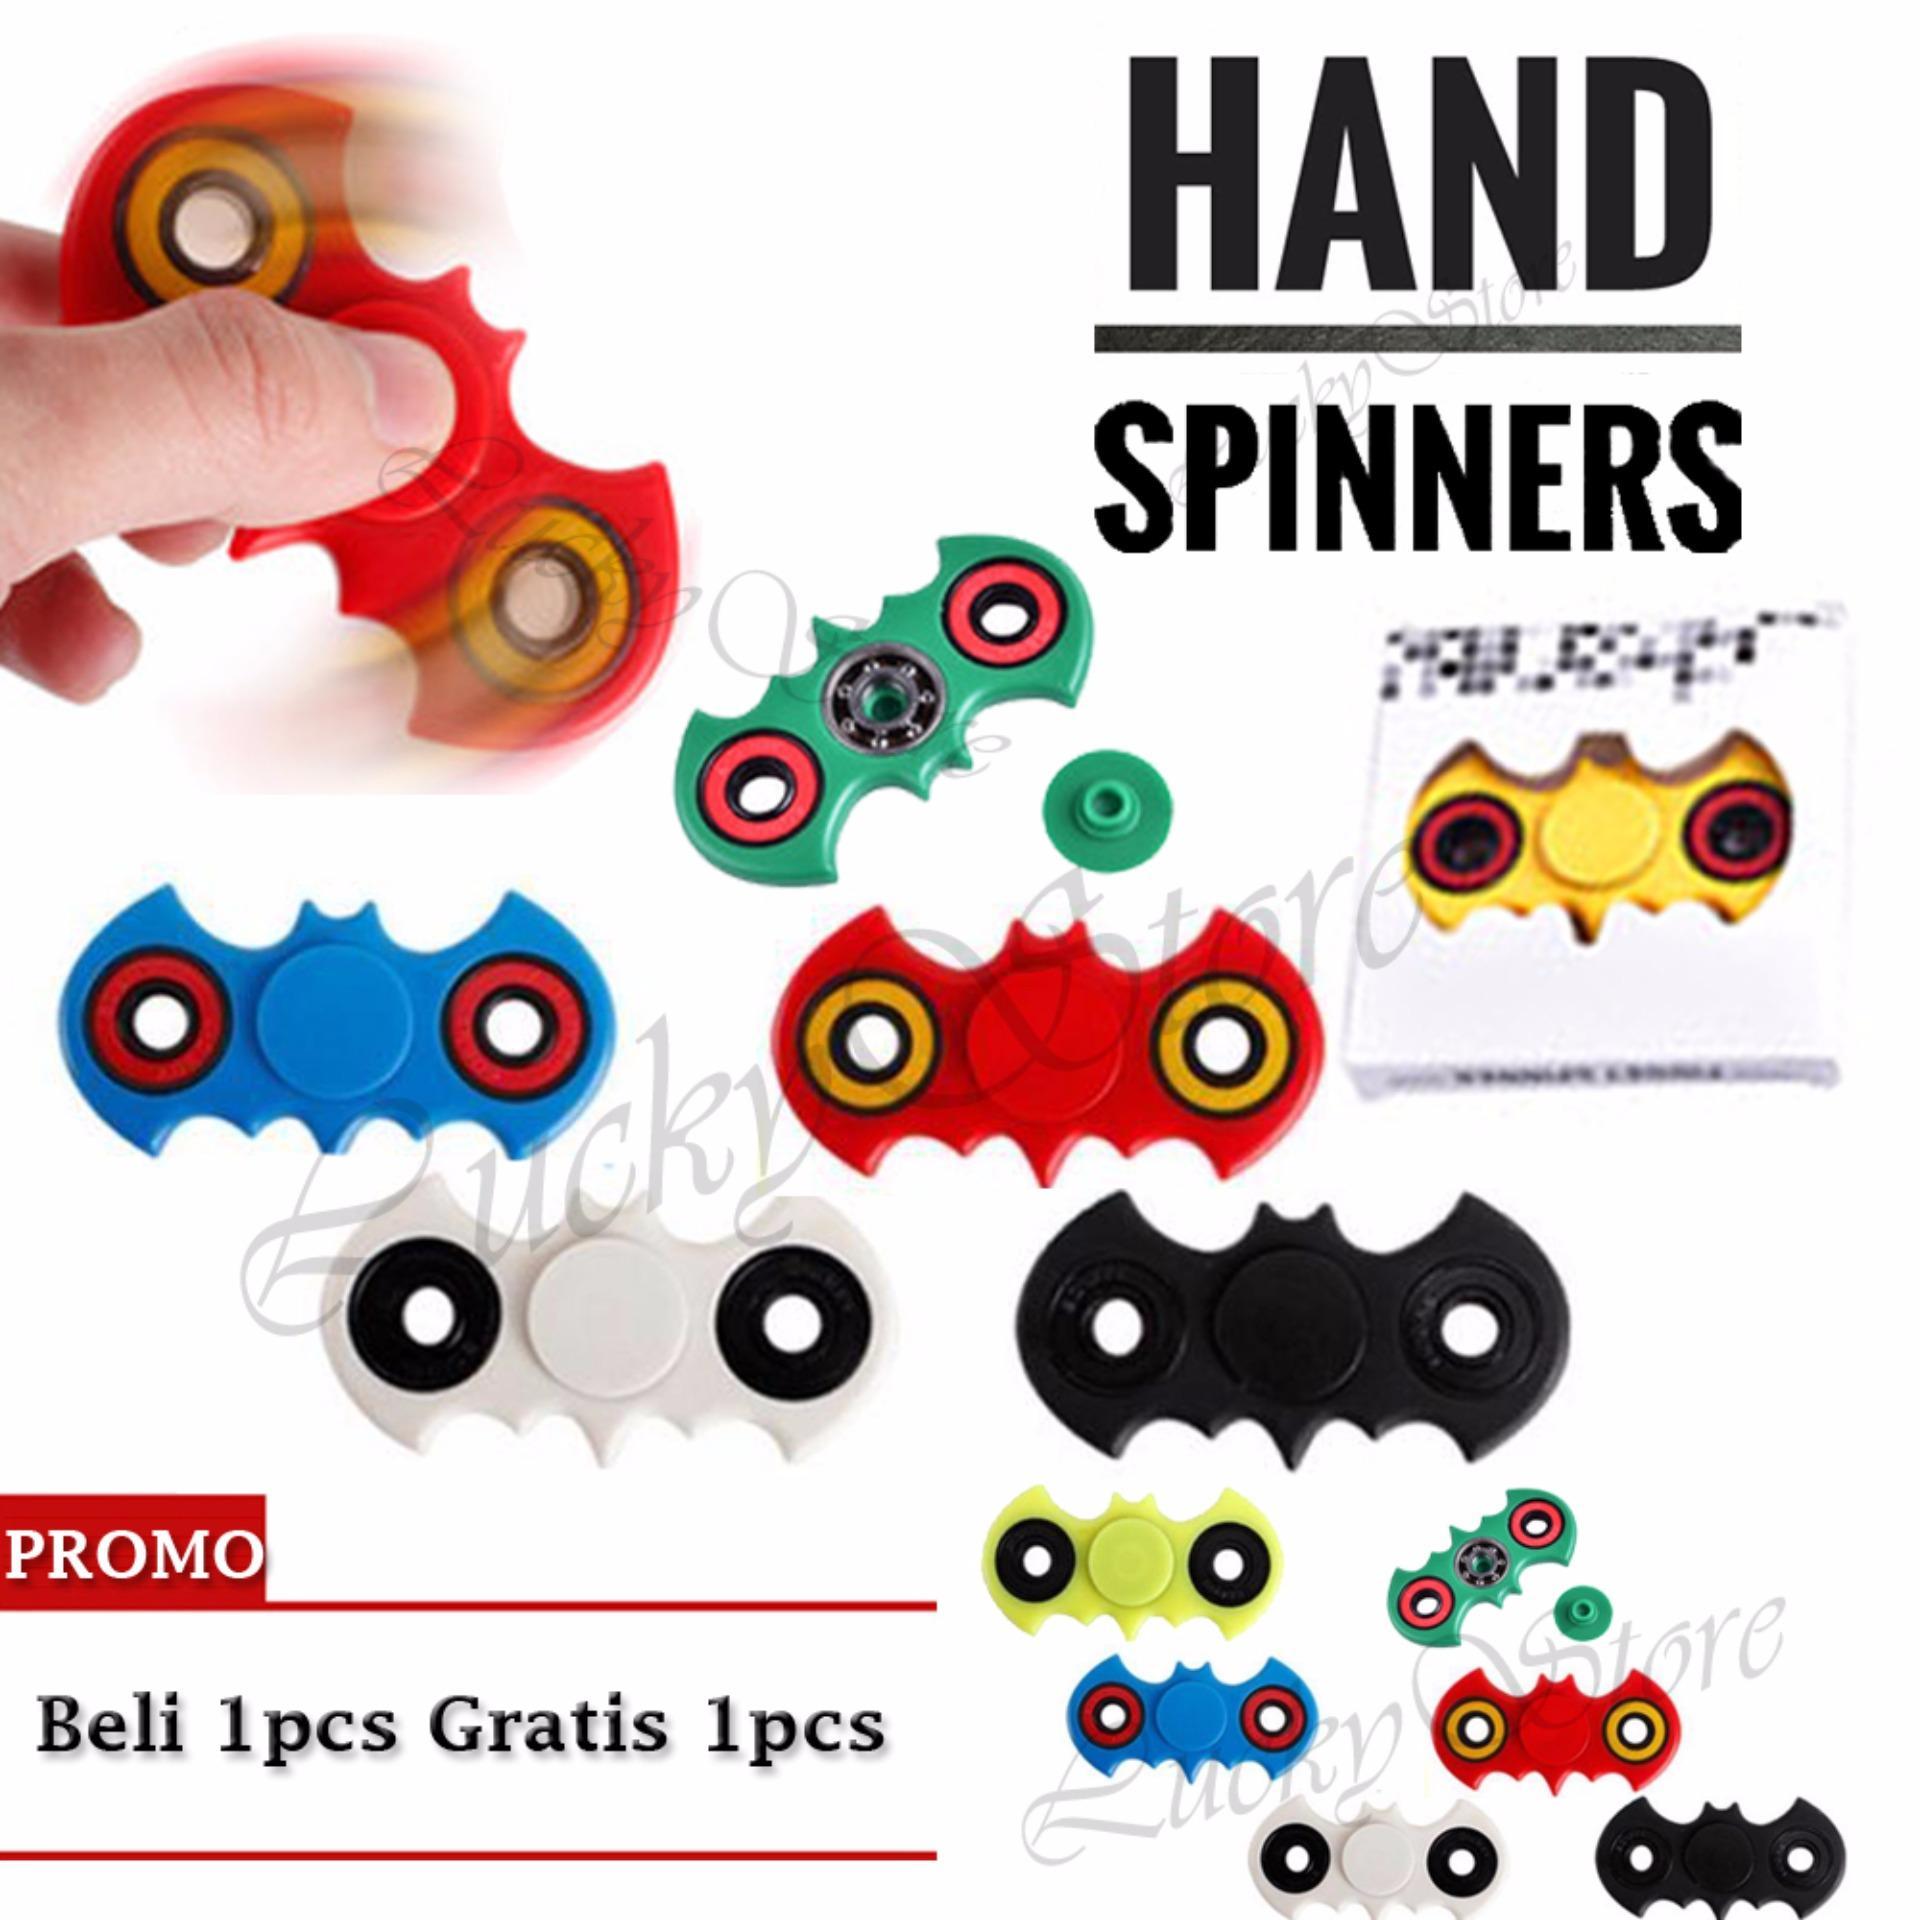 Hot Deals Lucky Fidget Spinner Hand Toys Focus Games / Mainan Spiner Tangan Penghilang Kebiasan Buruk